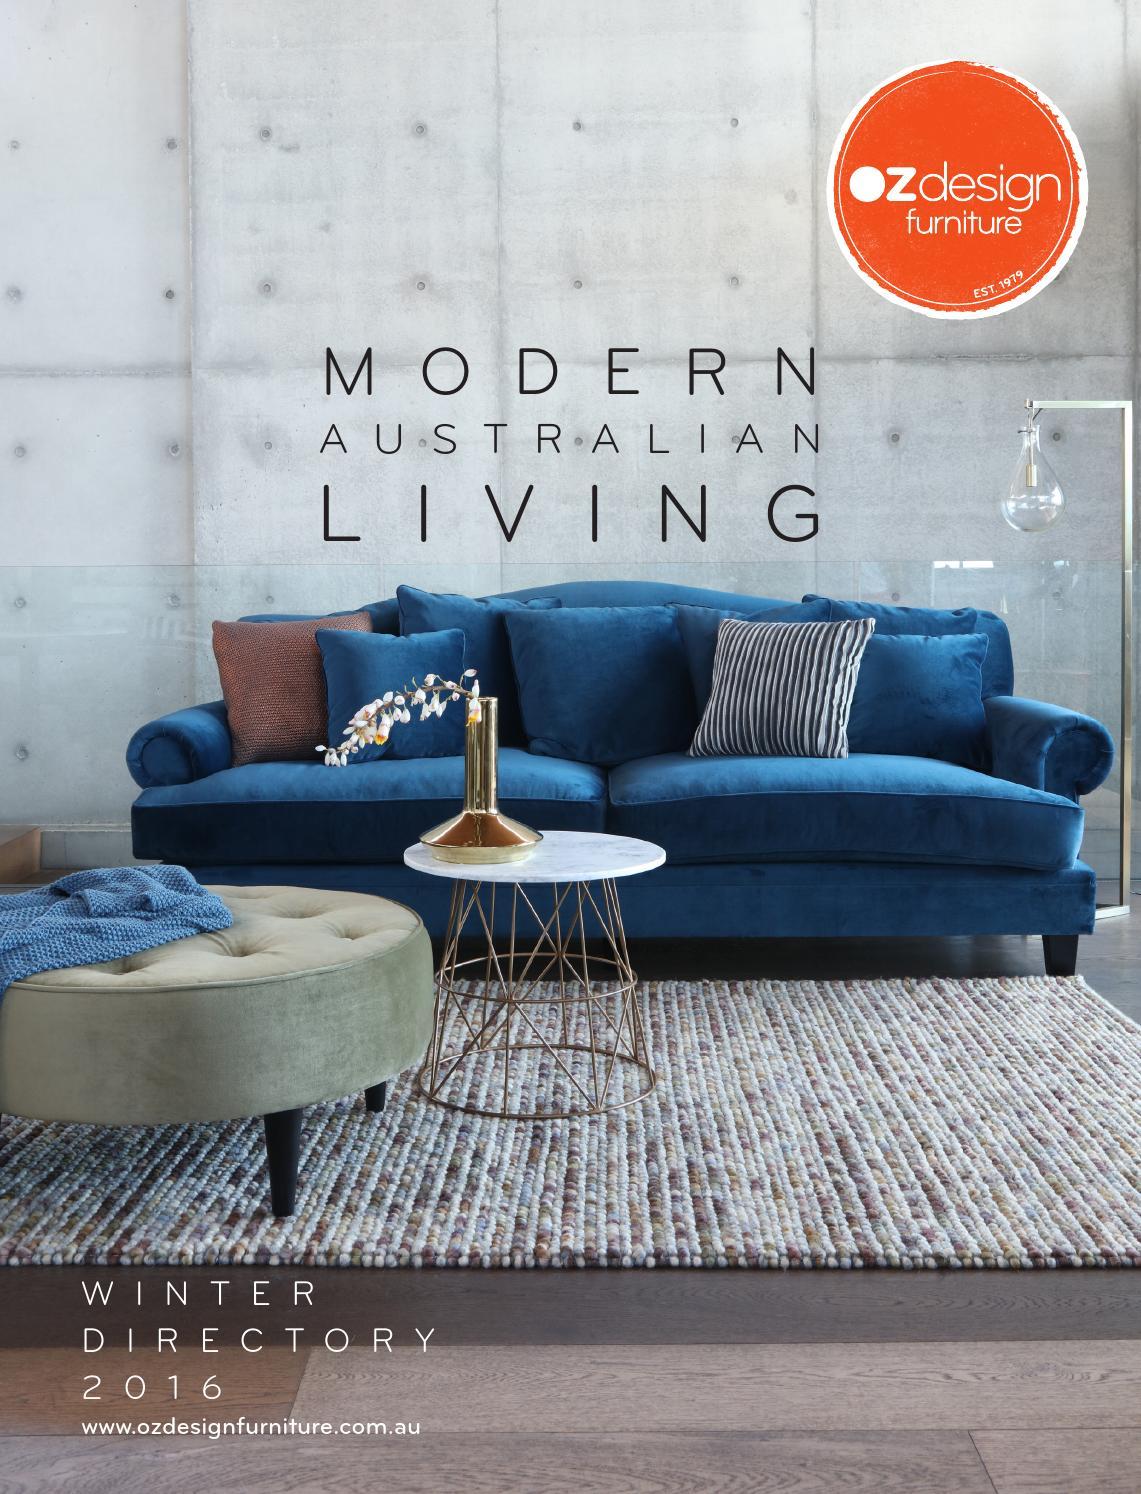 Modern Australian Living Oz Design Furniture Winter 16